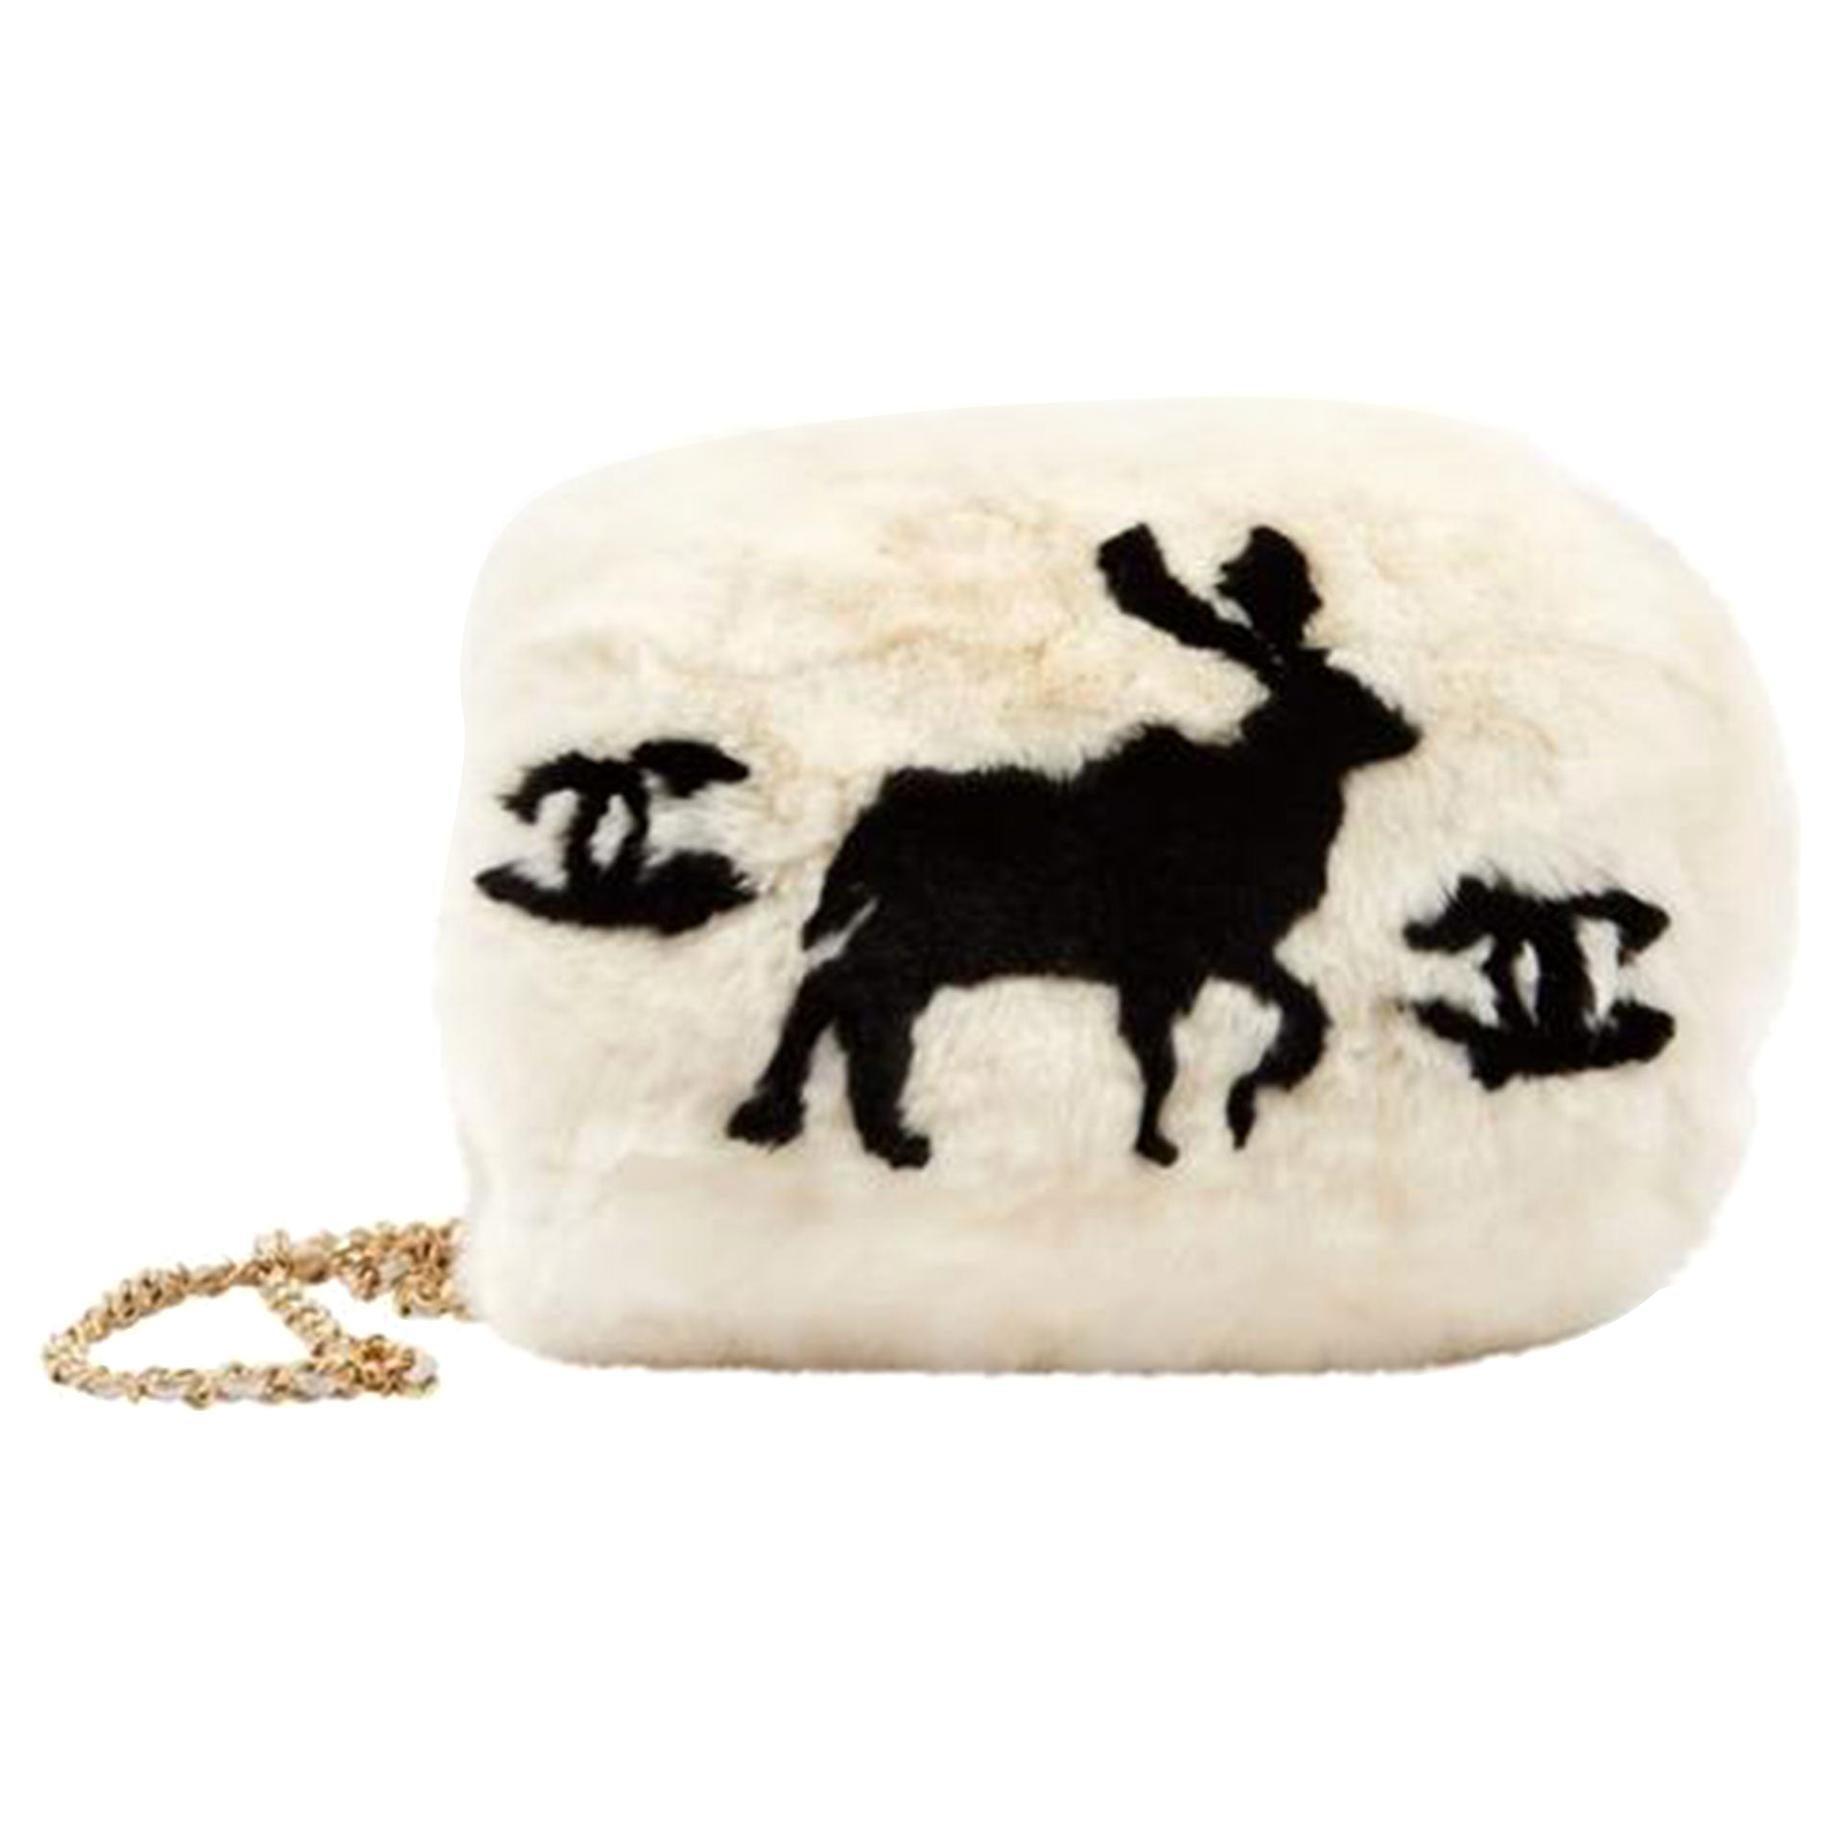 Chanel Cc Logo Reindeer Muff Vintage Rare Limited Edition White Fur Satchel